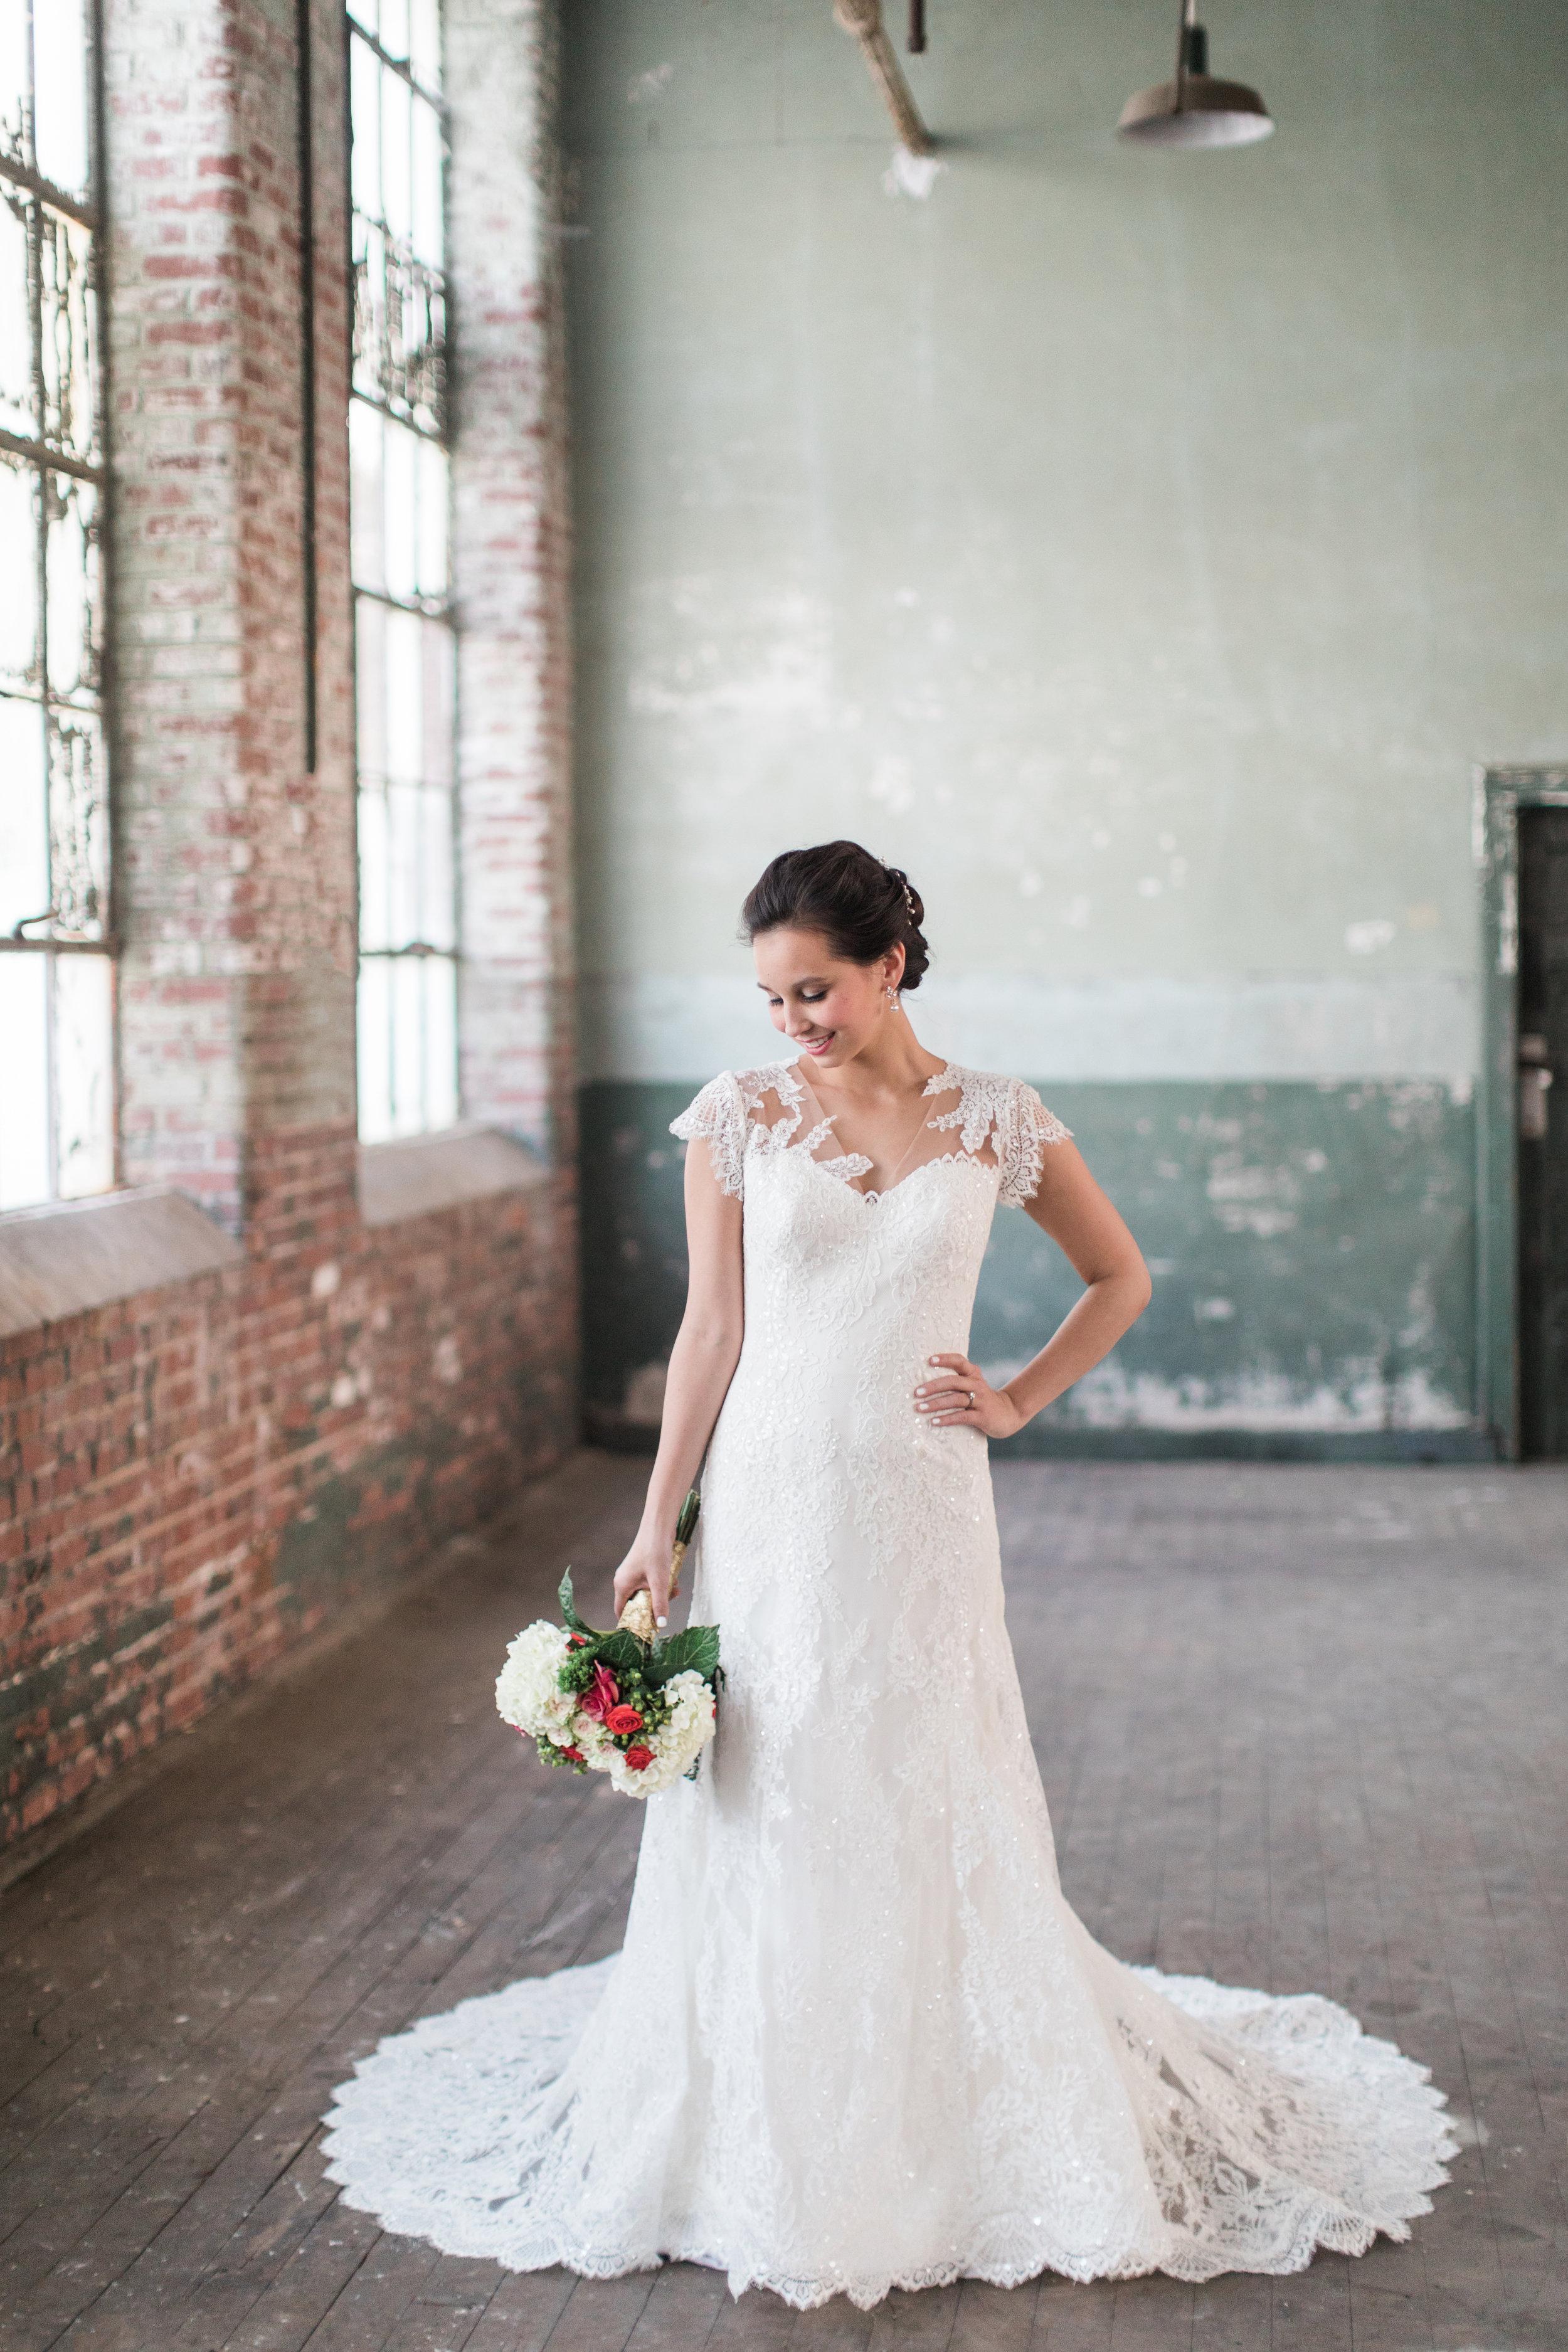 Megan-bridal-026.JPG